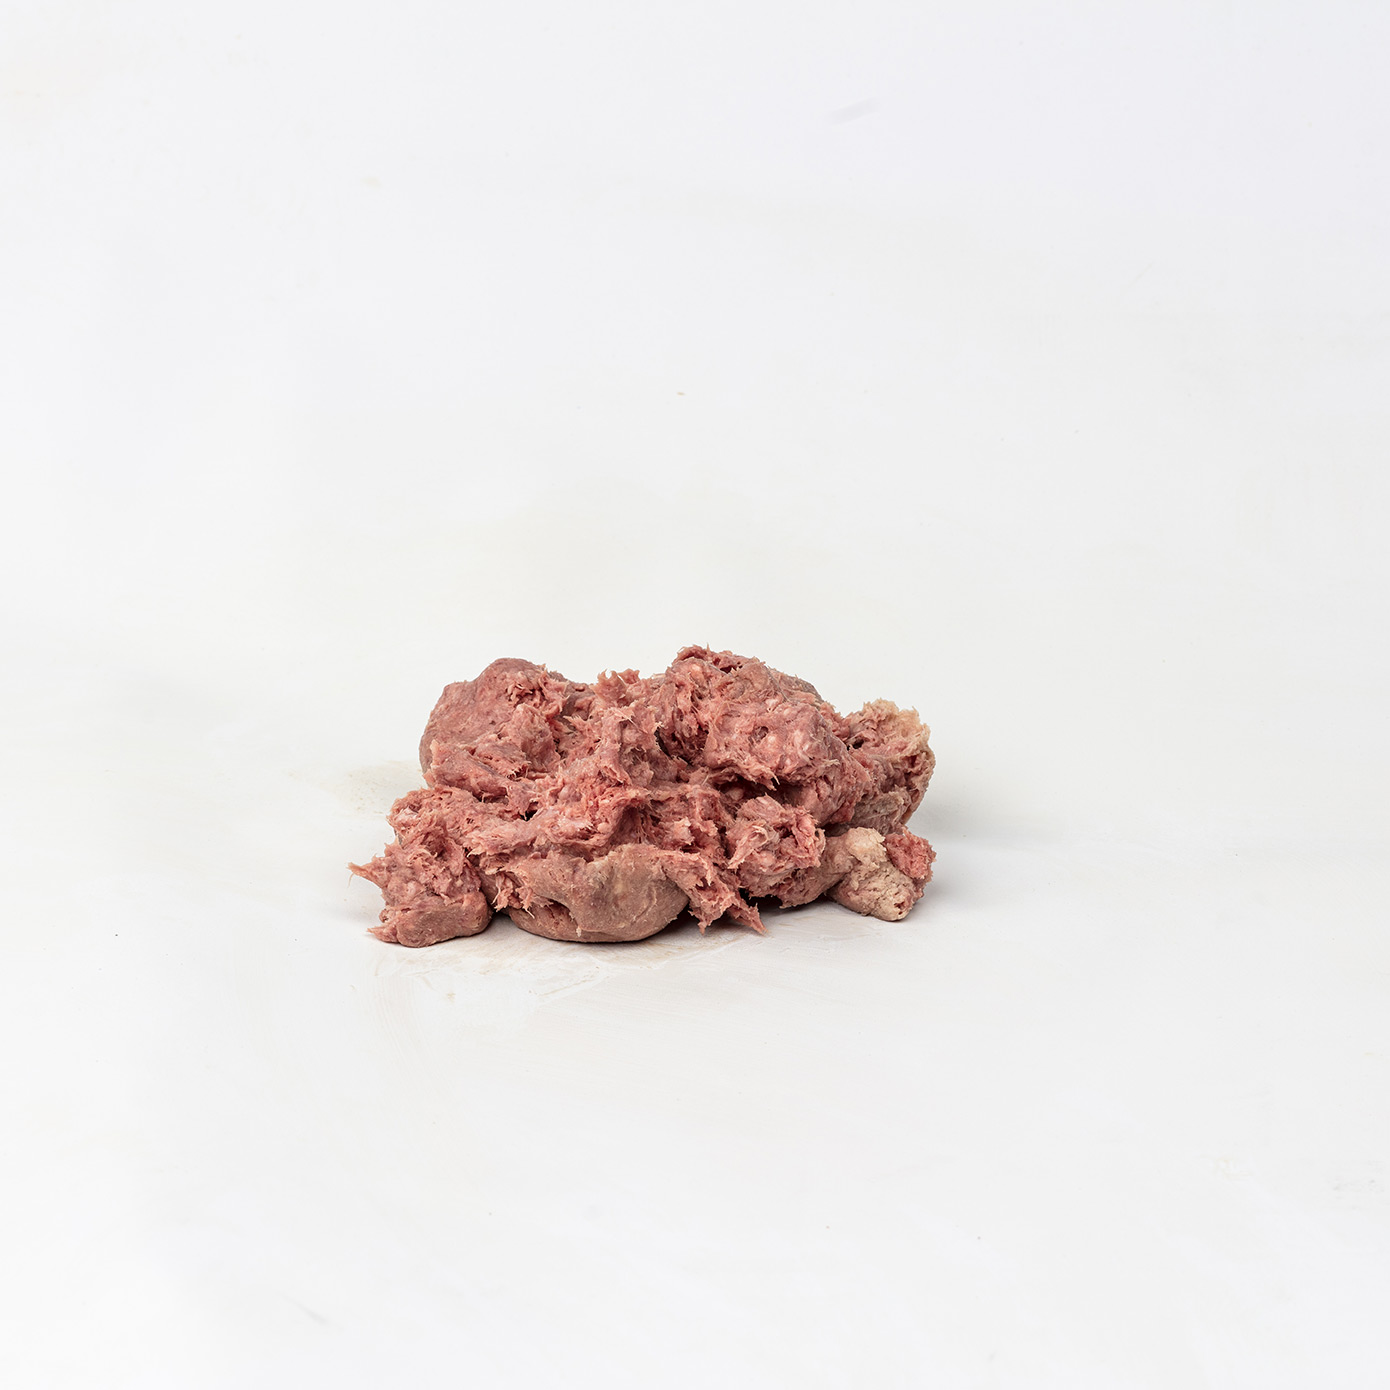 Top Quality Dog Food Lamb Prey Model Raw Frozen Dog Food, 30-lb case